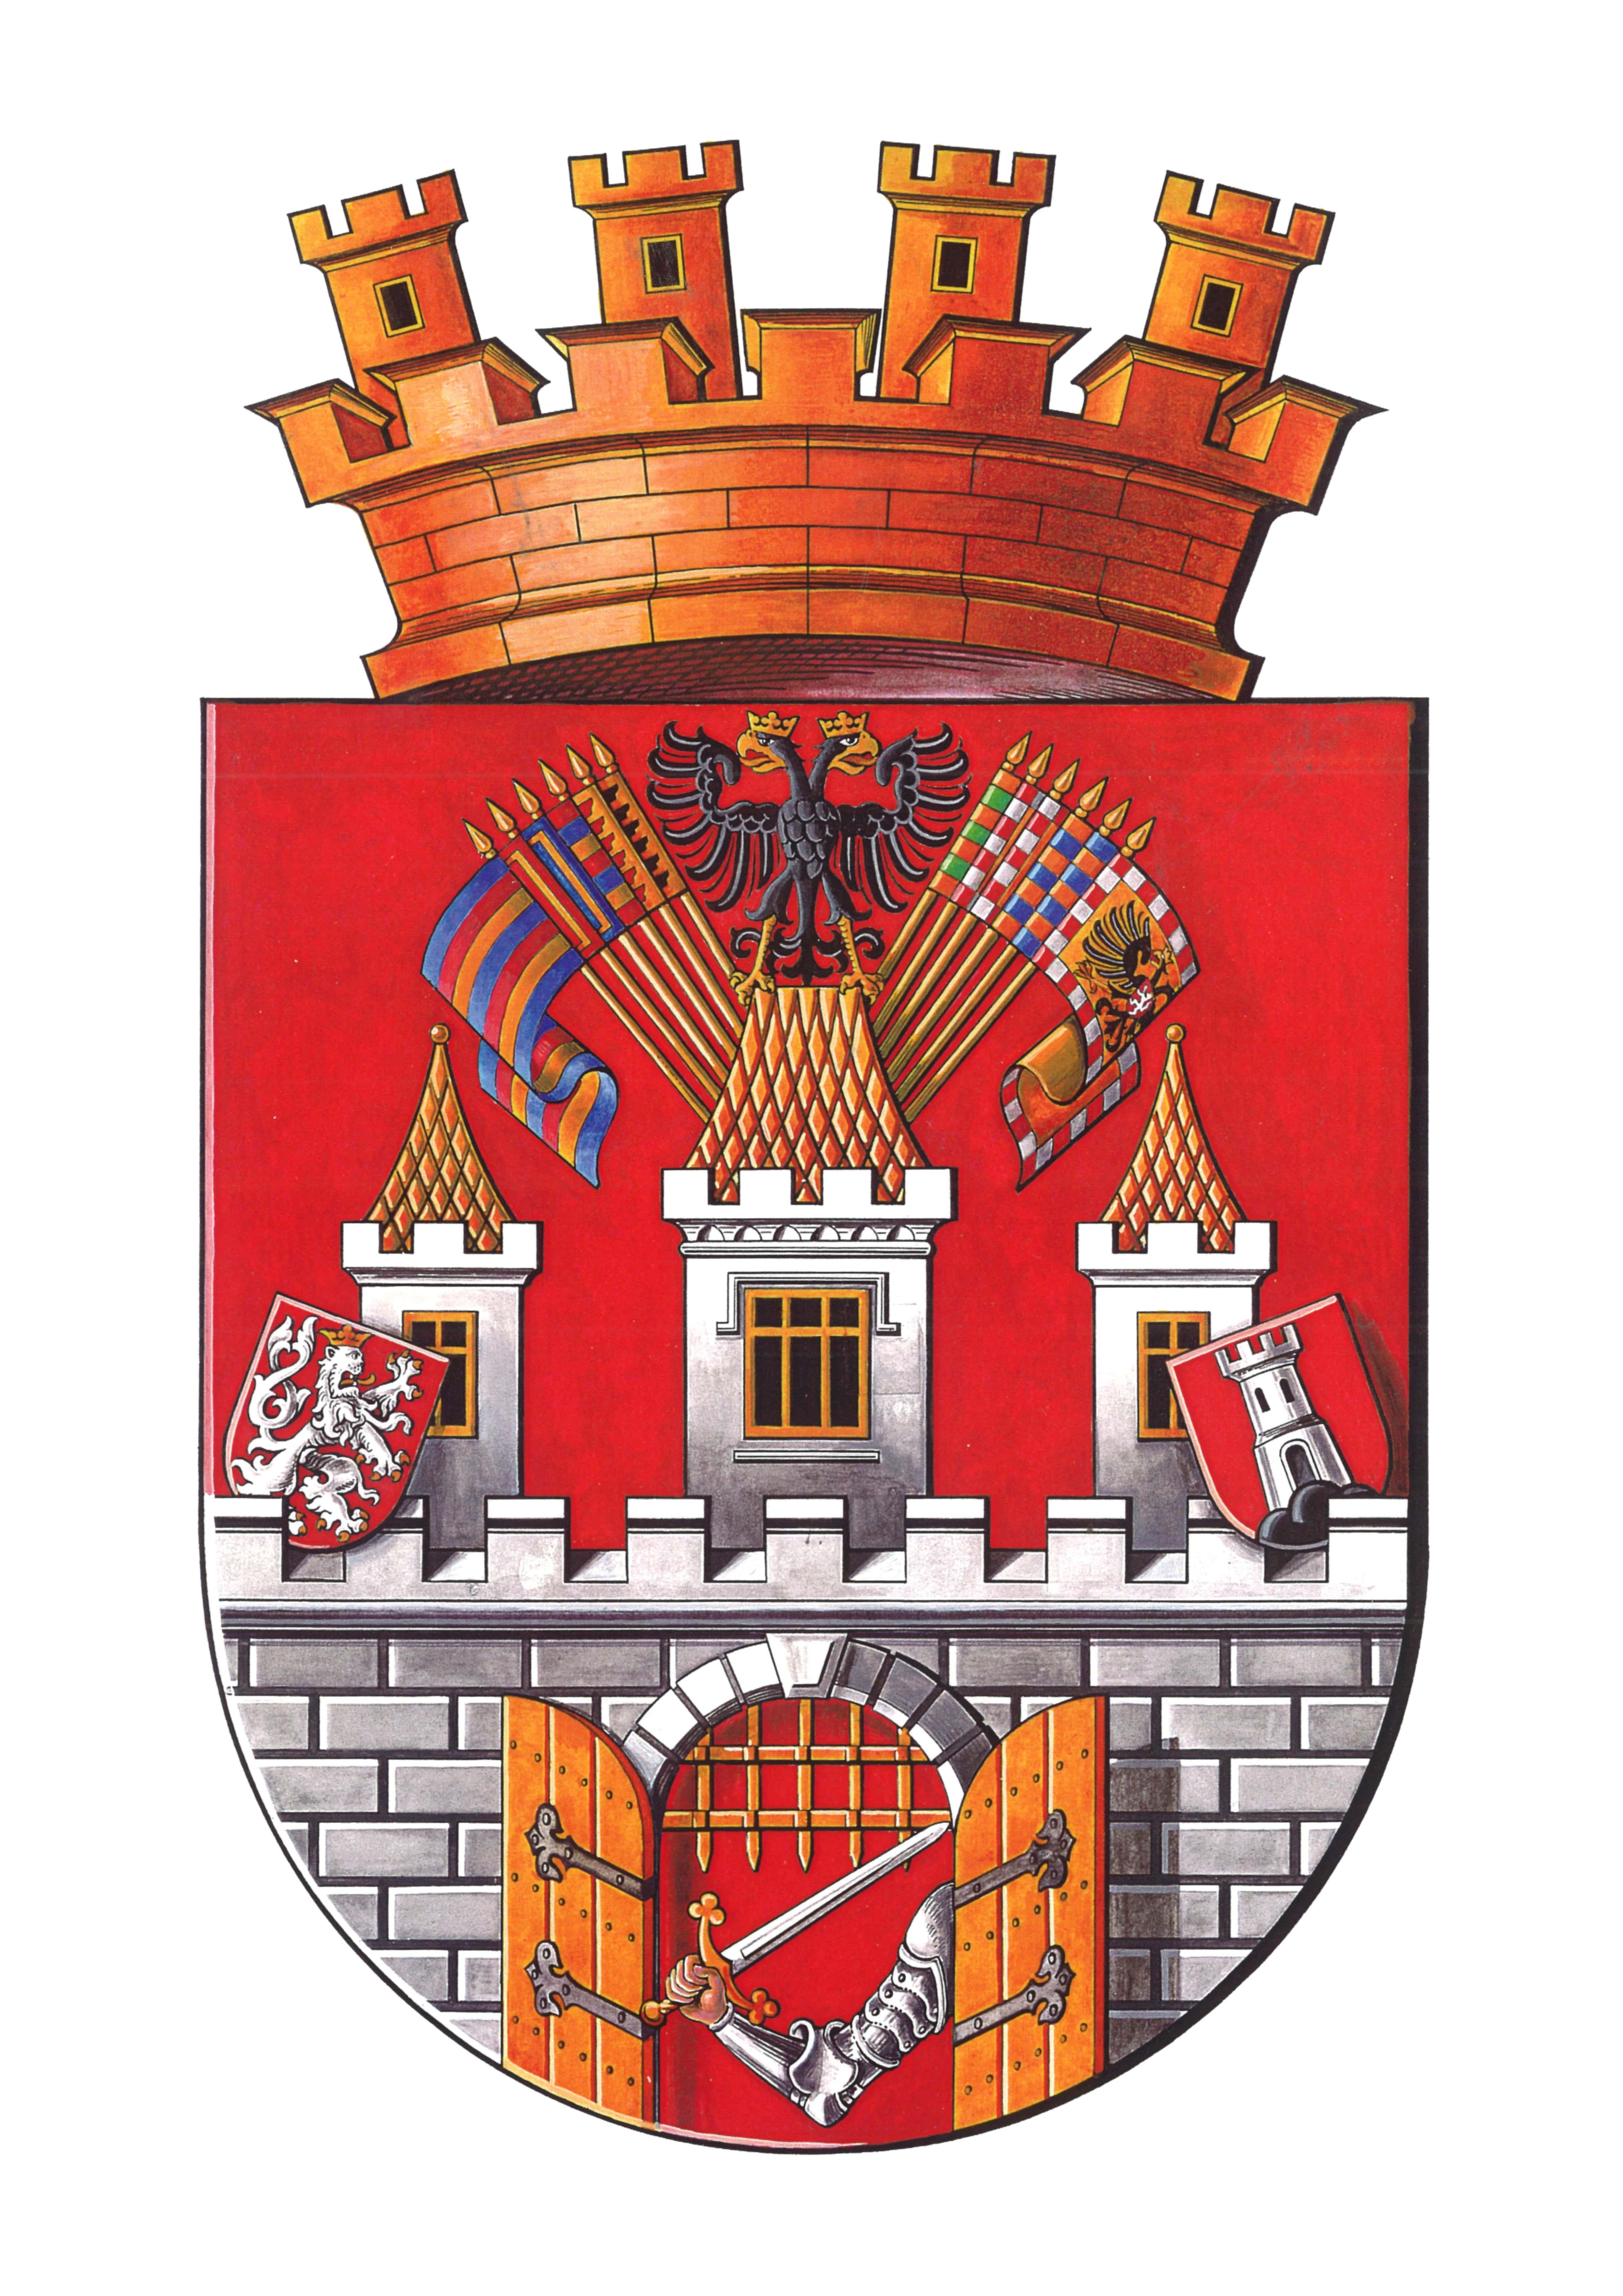 pozvanka-na-9-zasedani-zastupitelstva-mestske-casti-praha-5